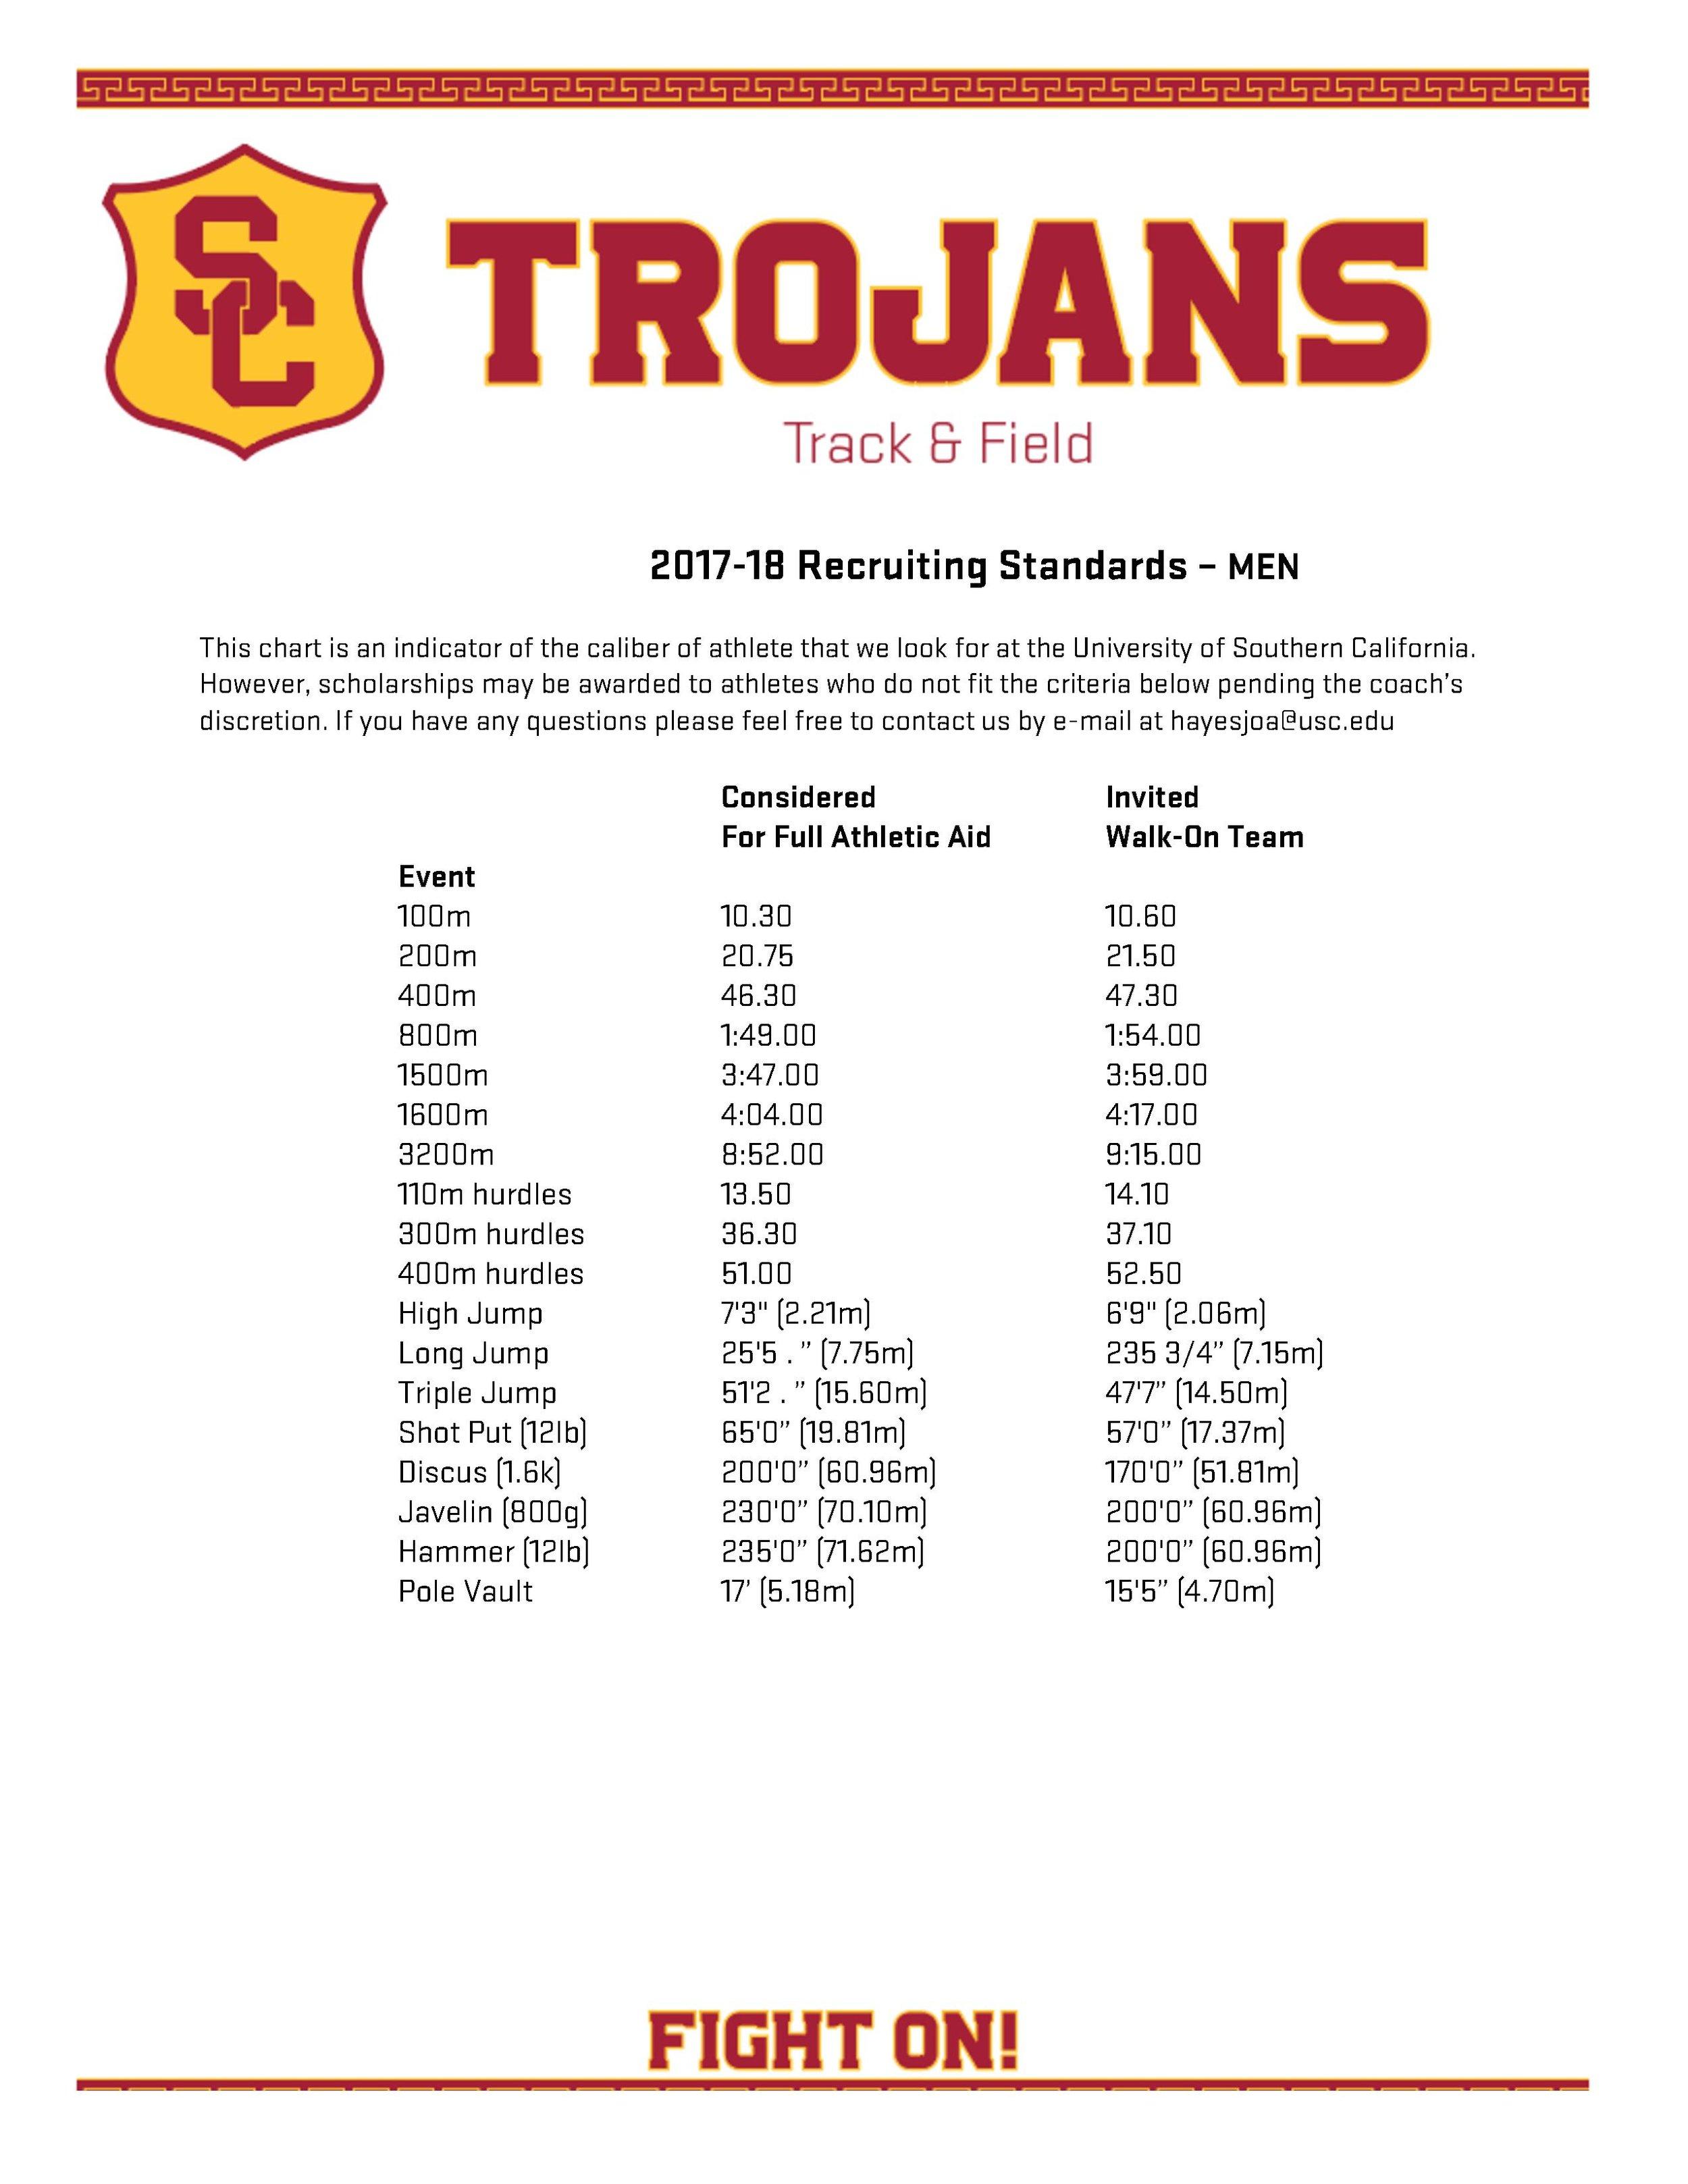 2017-18 Mens Recruiting Standards.jpg